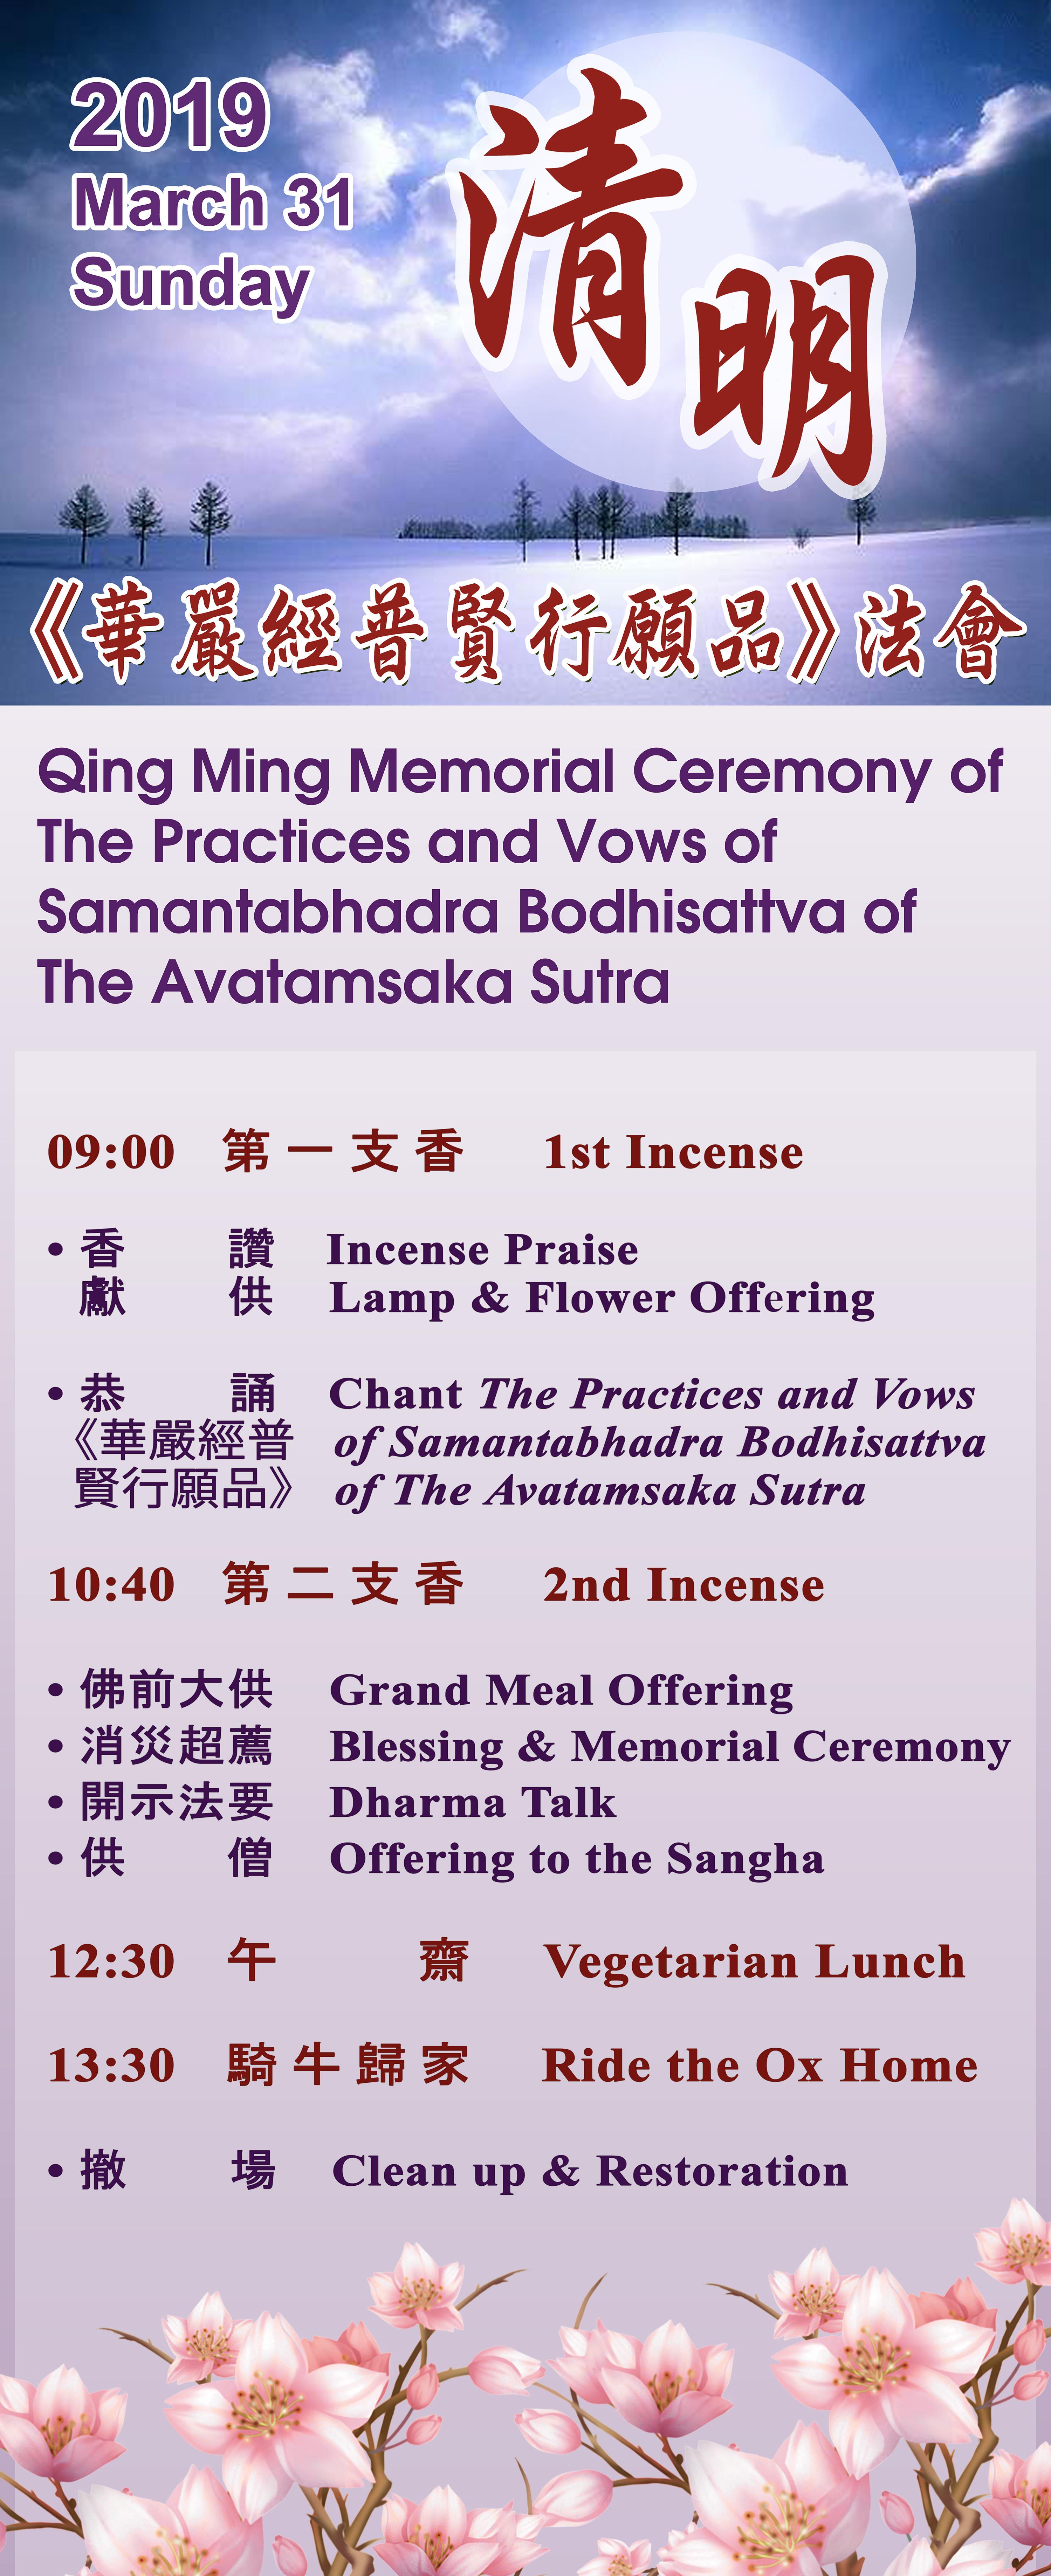 Qing Ming Memorial Ceremony